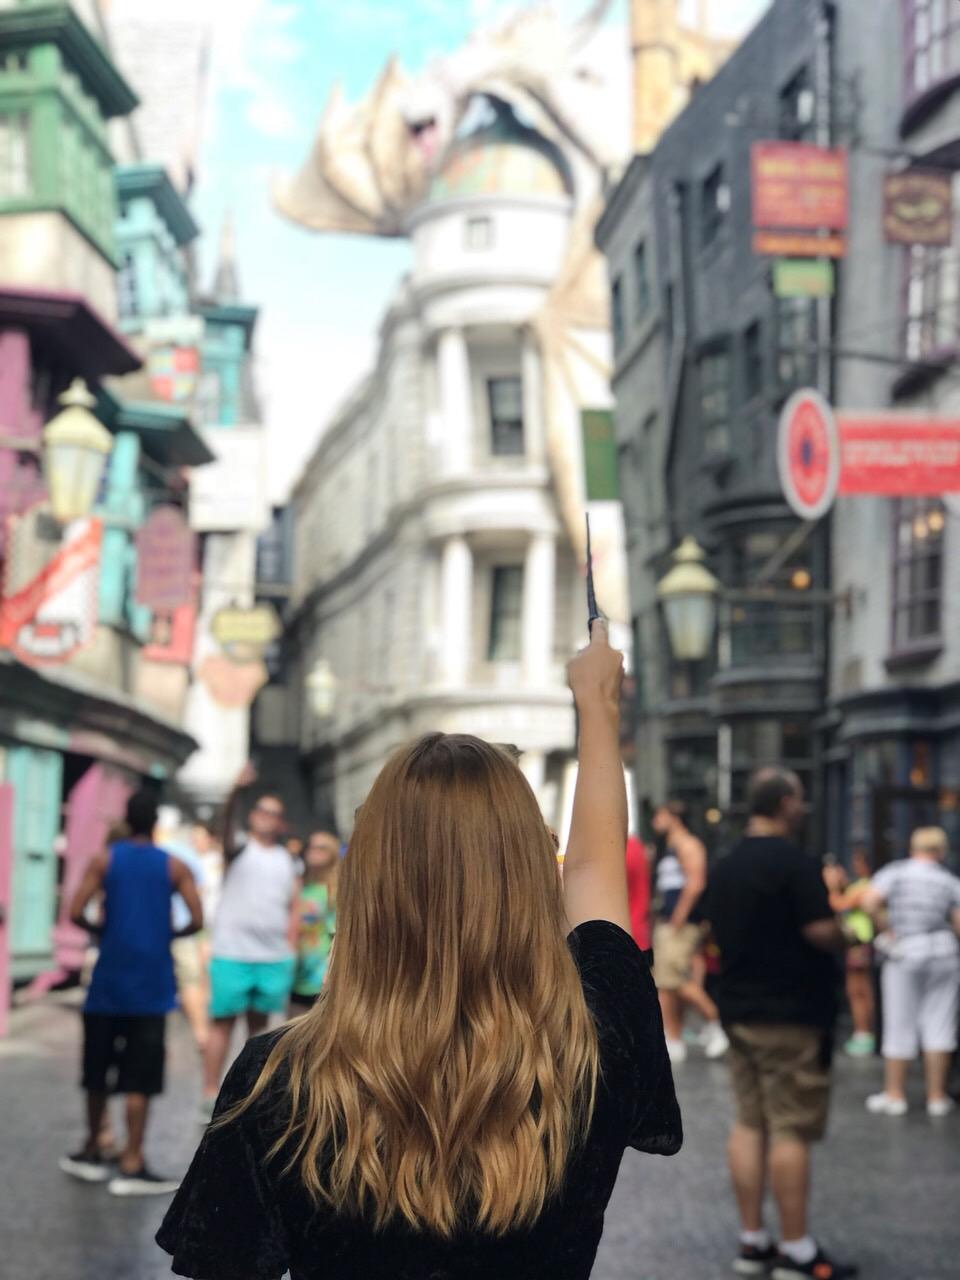 Gringotts Bank Universal Studios